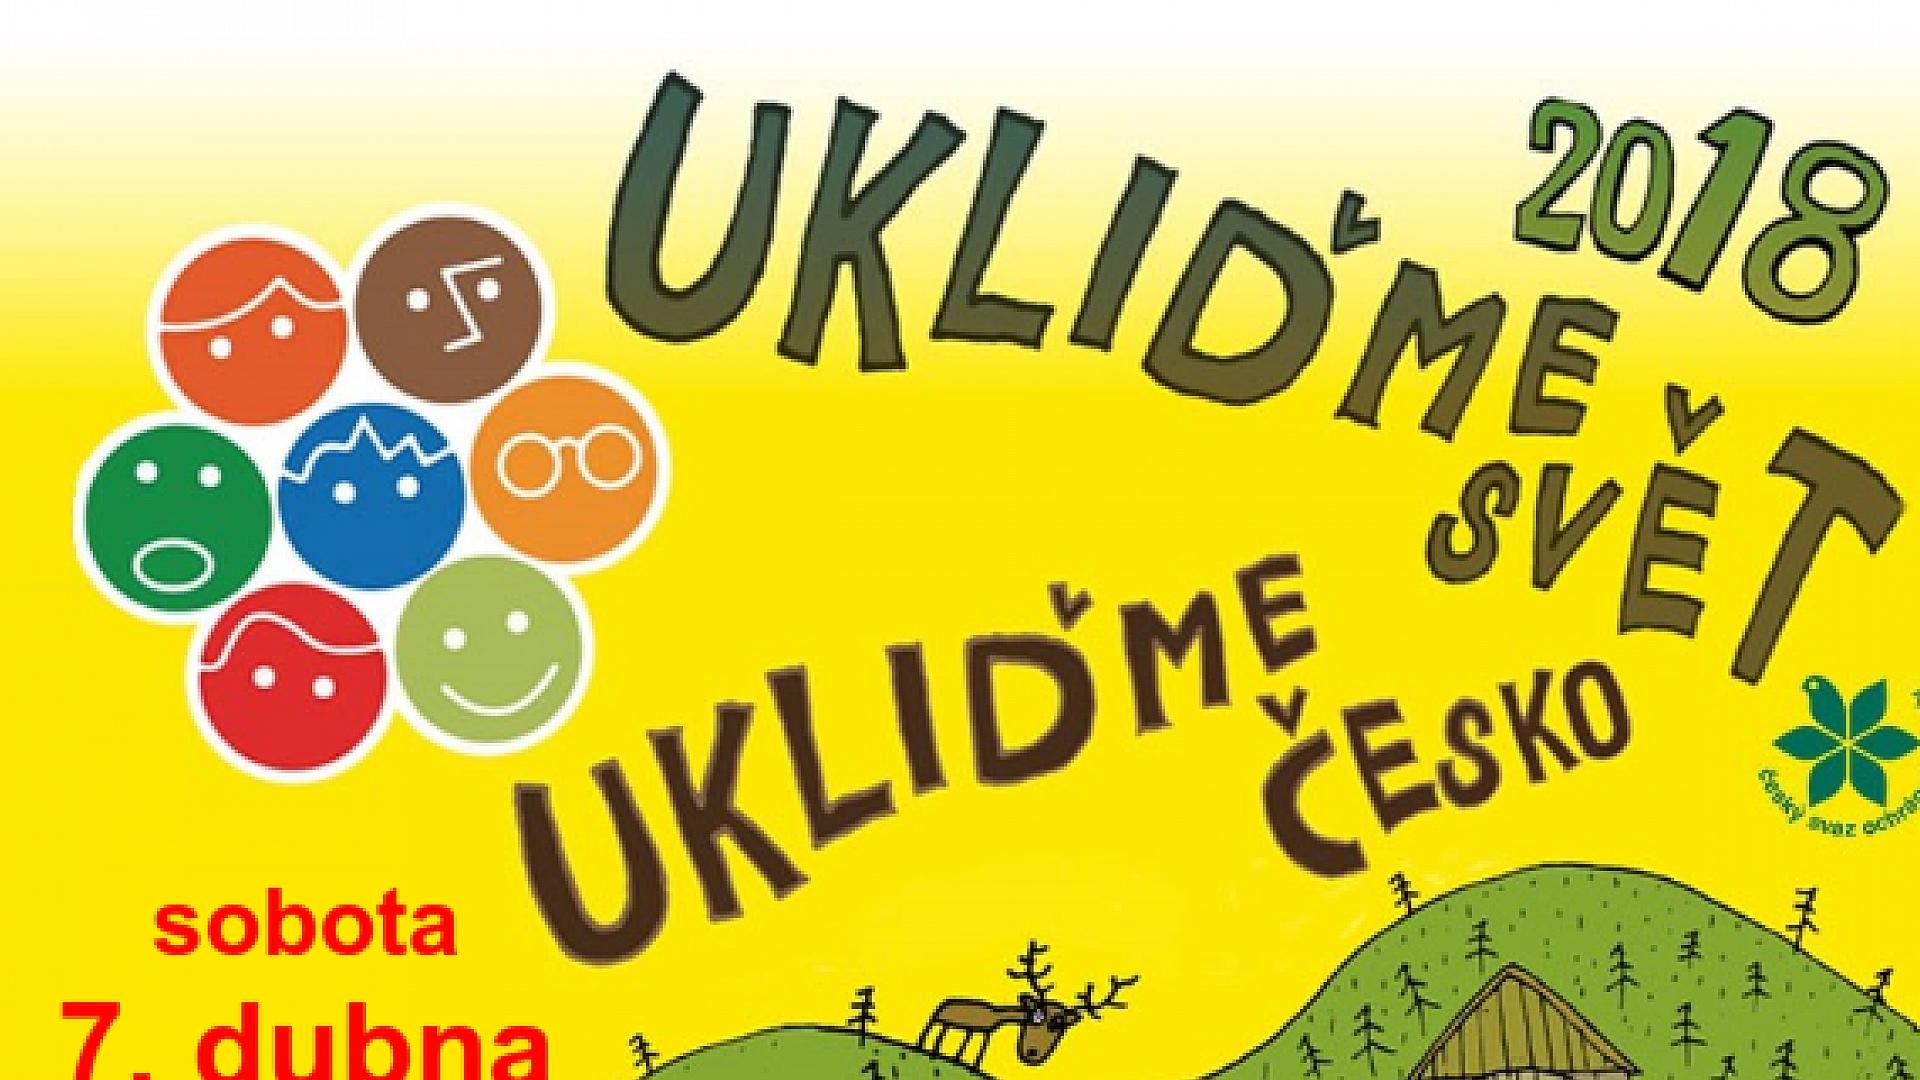 Obec Tichá - UKLIĎME ČESKO 2018